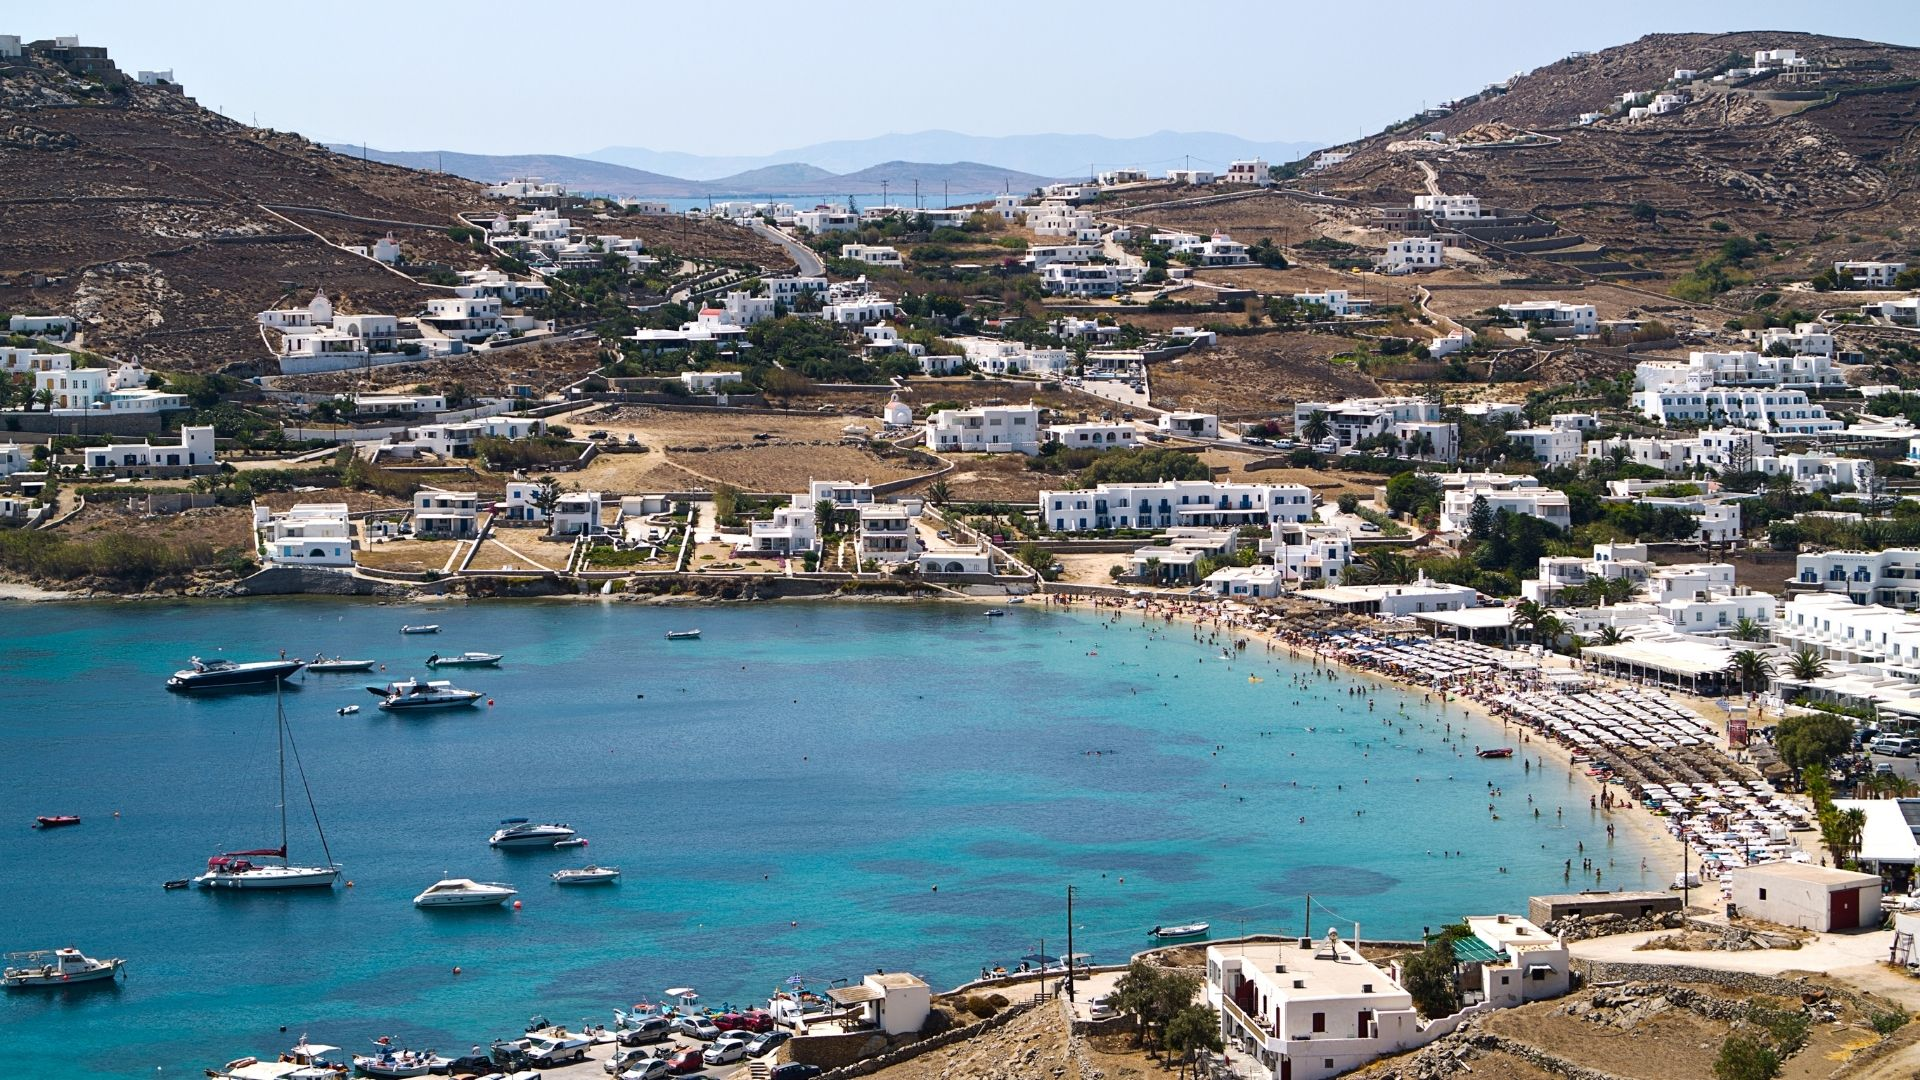 The seaside village of Ornos